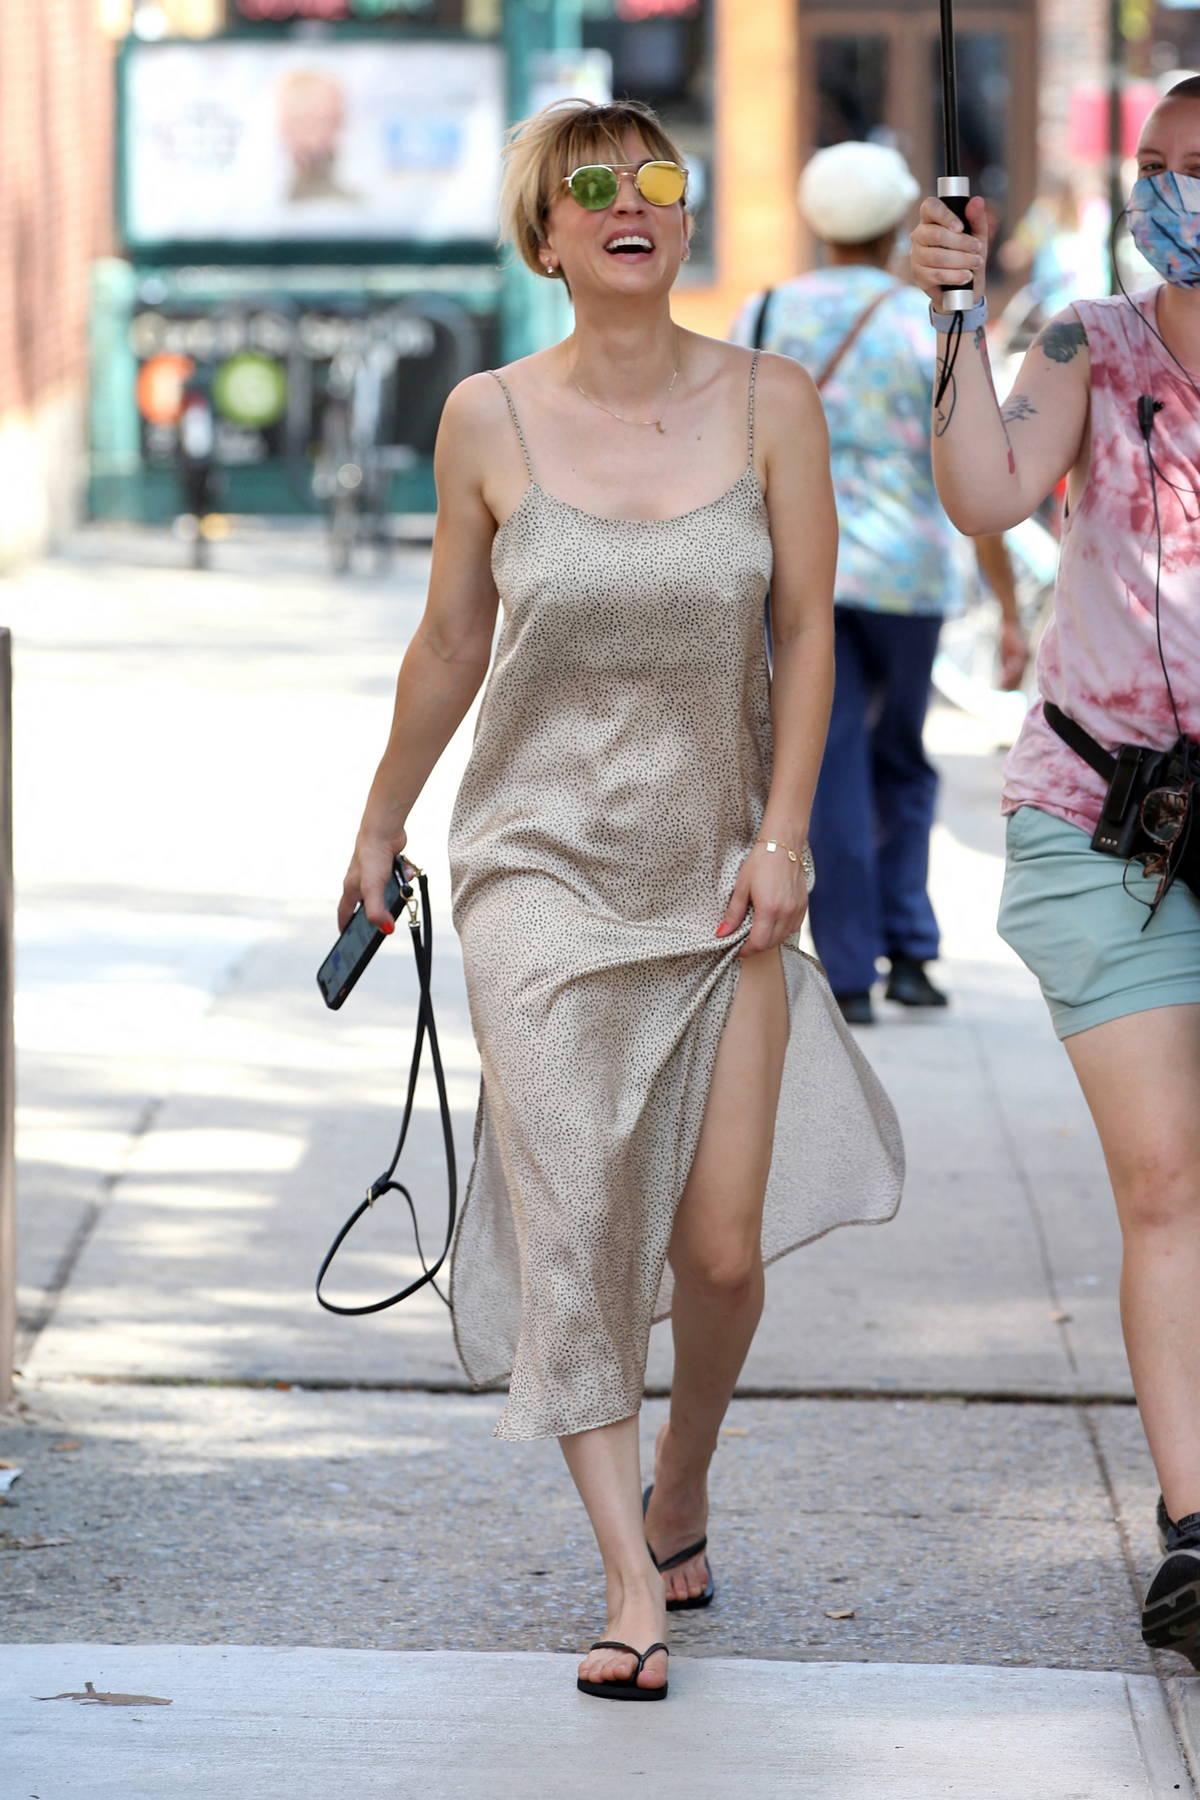 Kaley Cuoco wears a silver slip dress on the set of 'Meet Cute' in Brooklyn, New York City